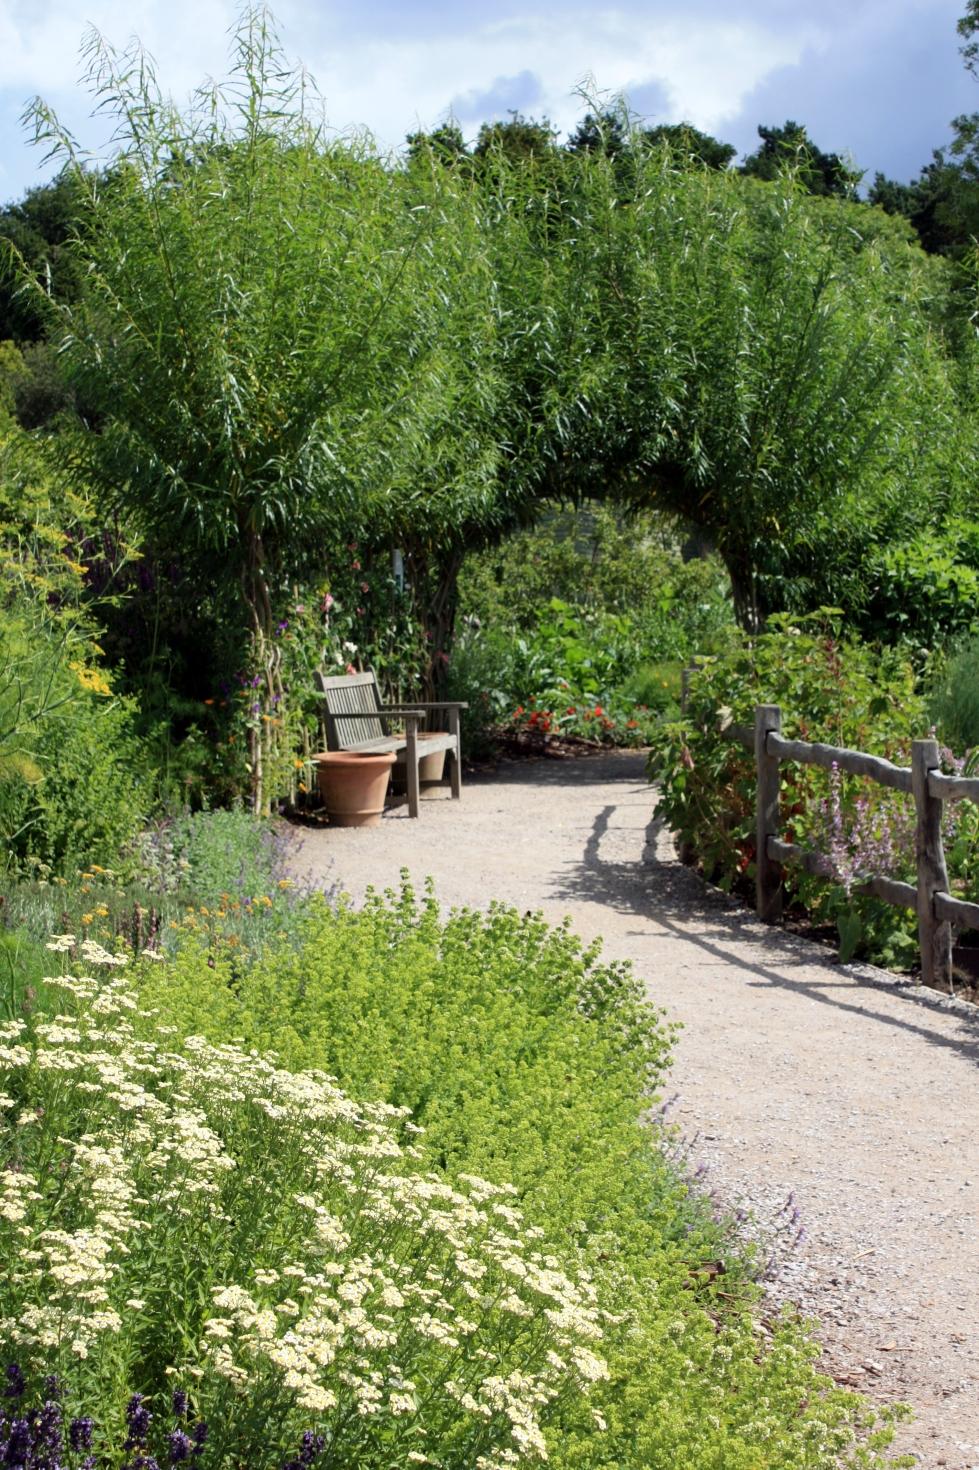 Walk through the vegetable garden, RHS Harlow Carr, July 2013